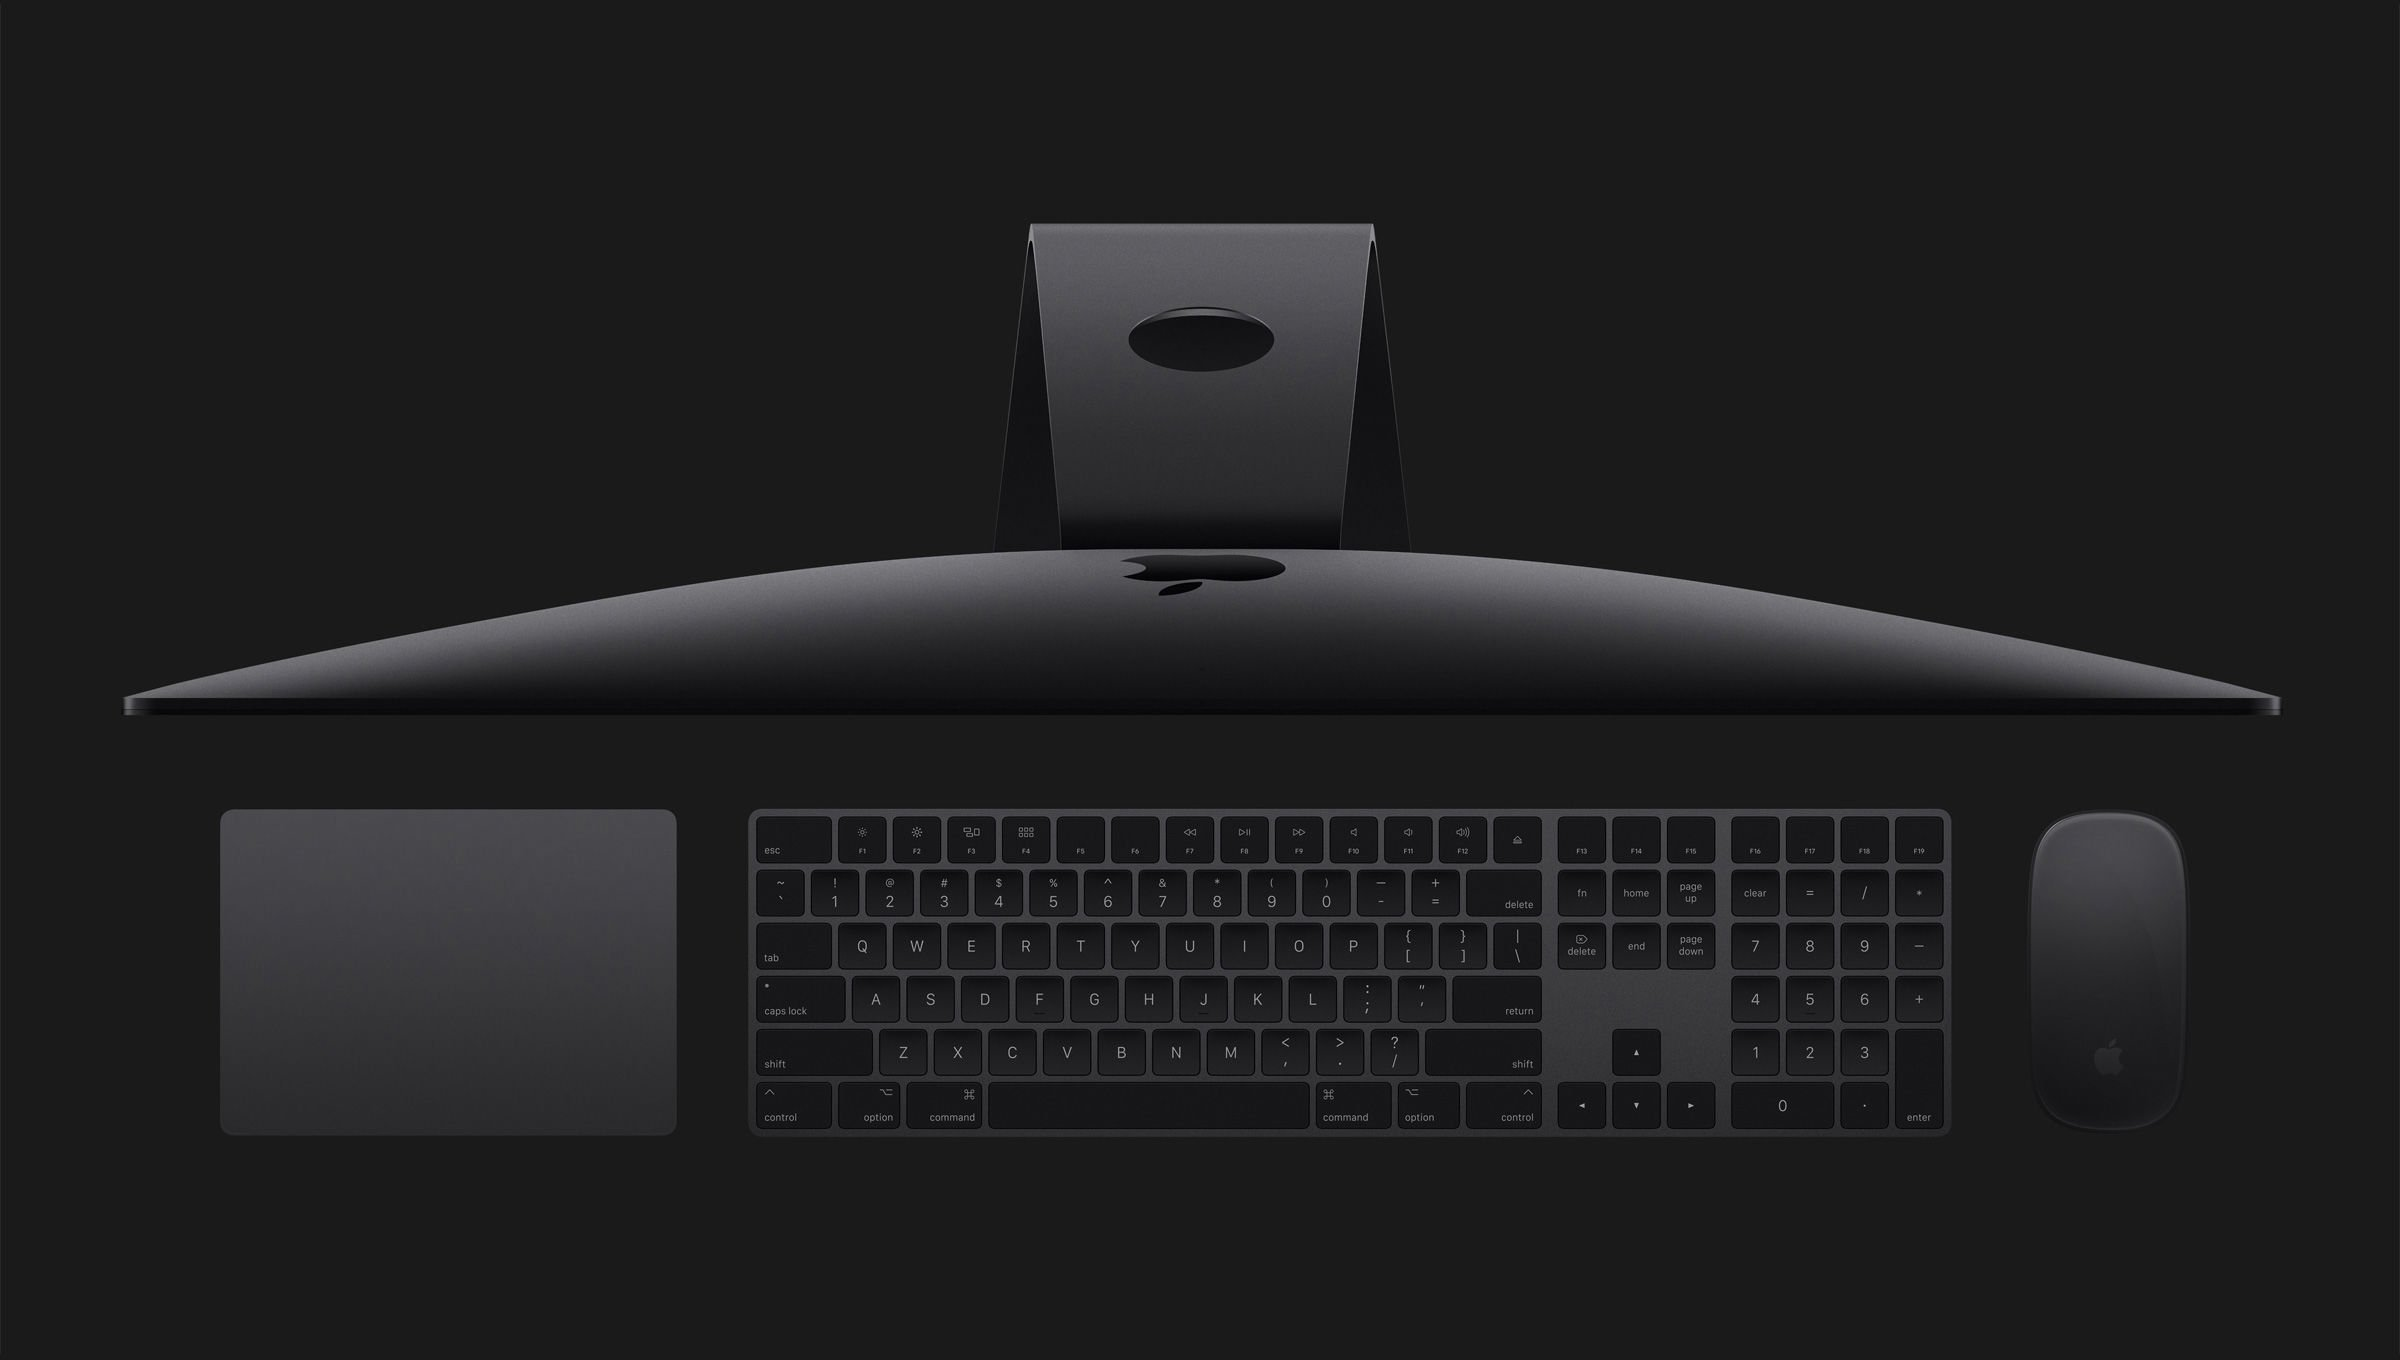 iMac Pro Akan Dibekali Prosesor Server Intel Purley